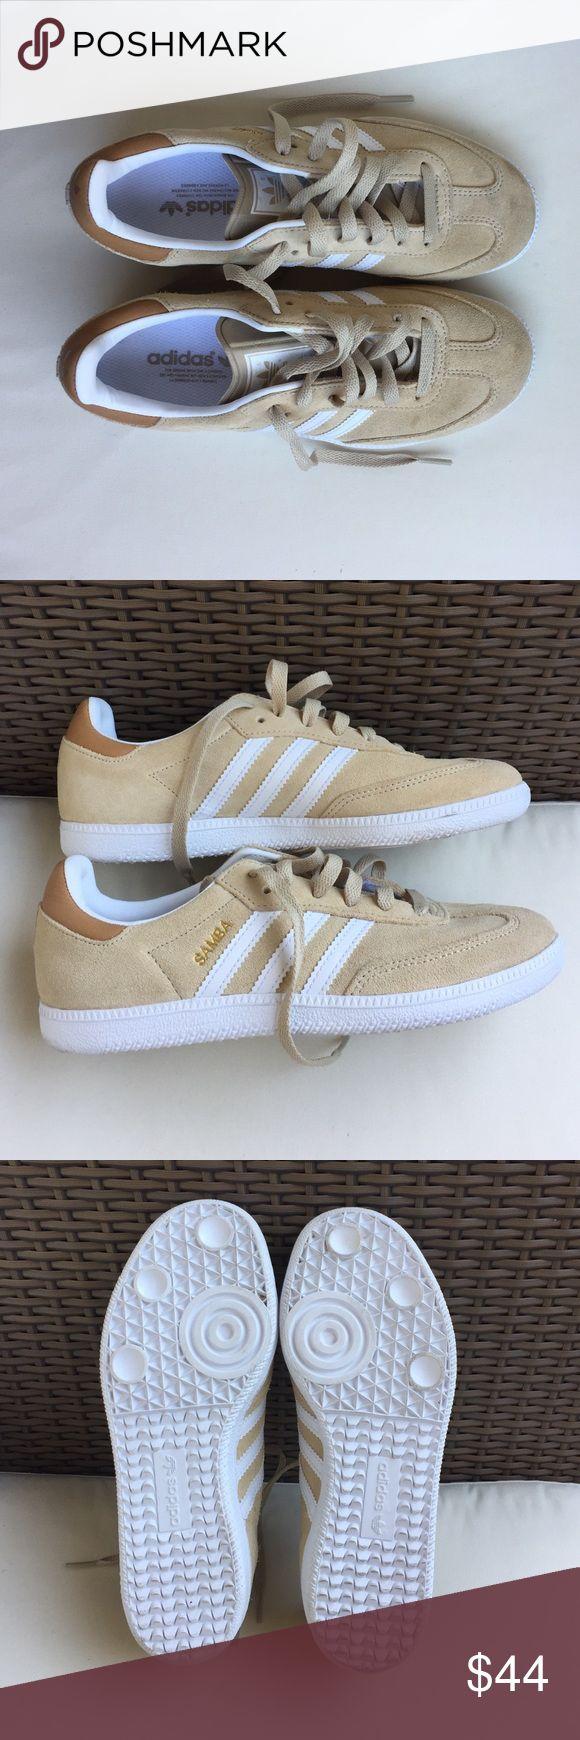 Like New Adidas Samba Sneaker - size 5 Like New! Worn once. Adidas Samba Sneakers. Tan, with gold Samba lettering. Size 5 Men's (6.5/7 Women's) Adidas Shoes Sneakers